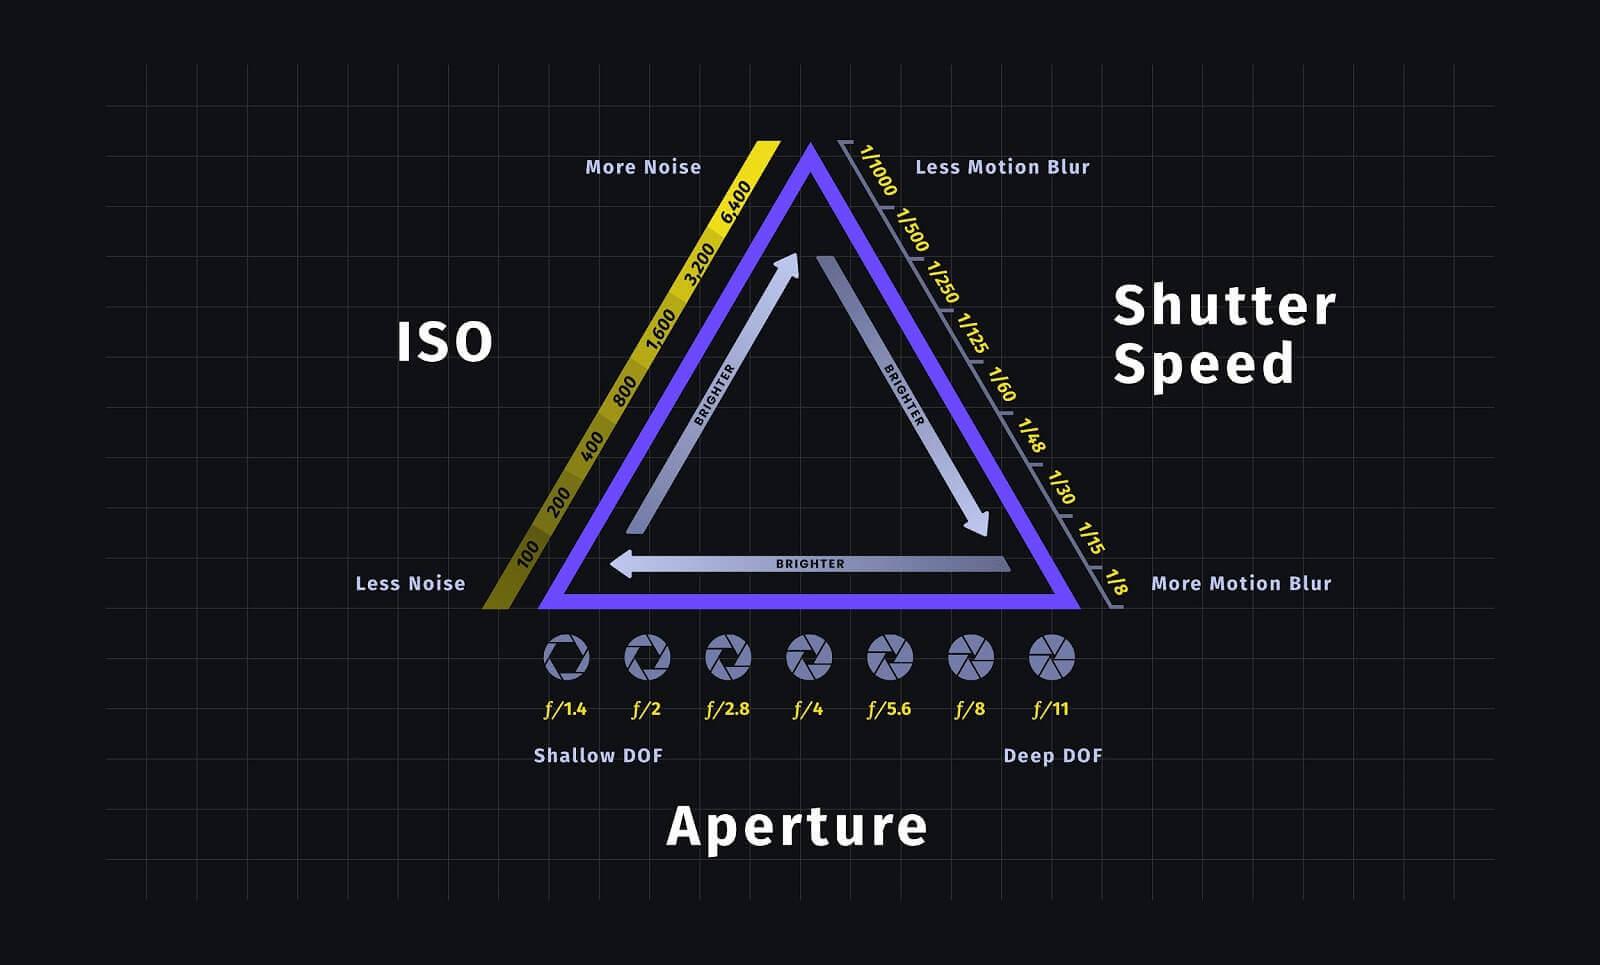 What is Underexposure - The Exposure Triangle of StudioBinder